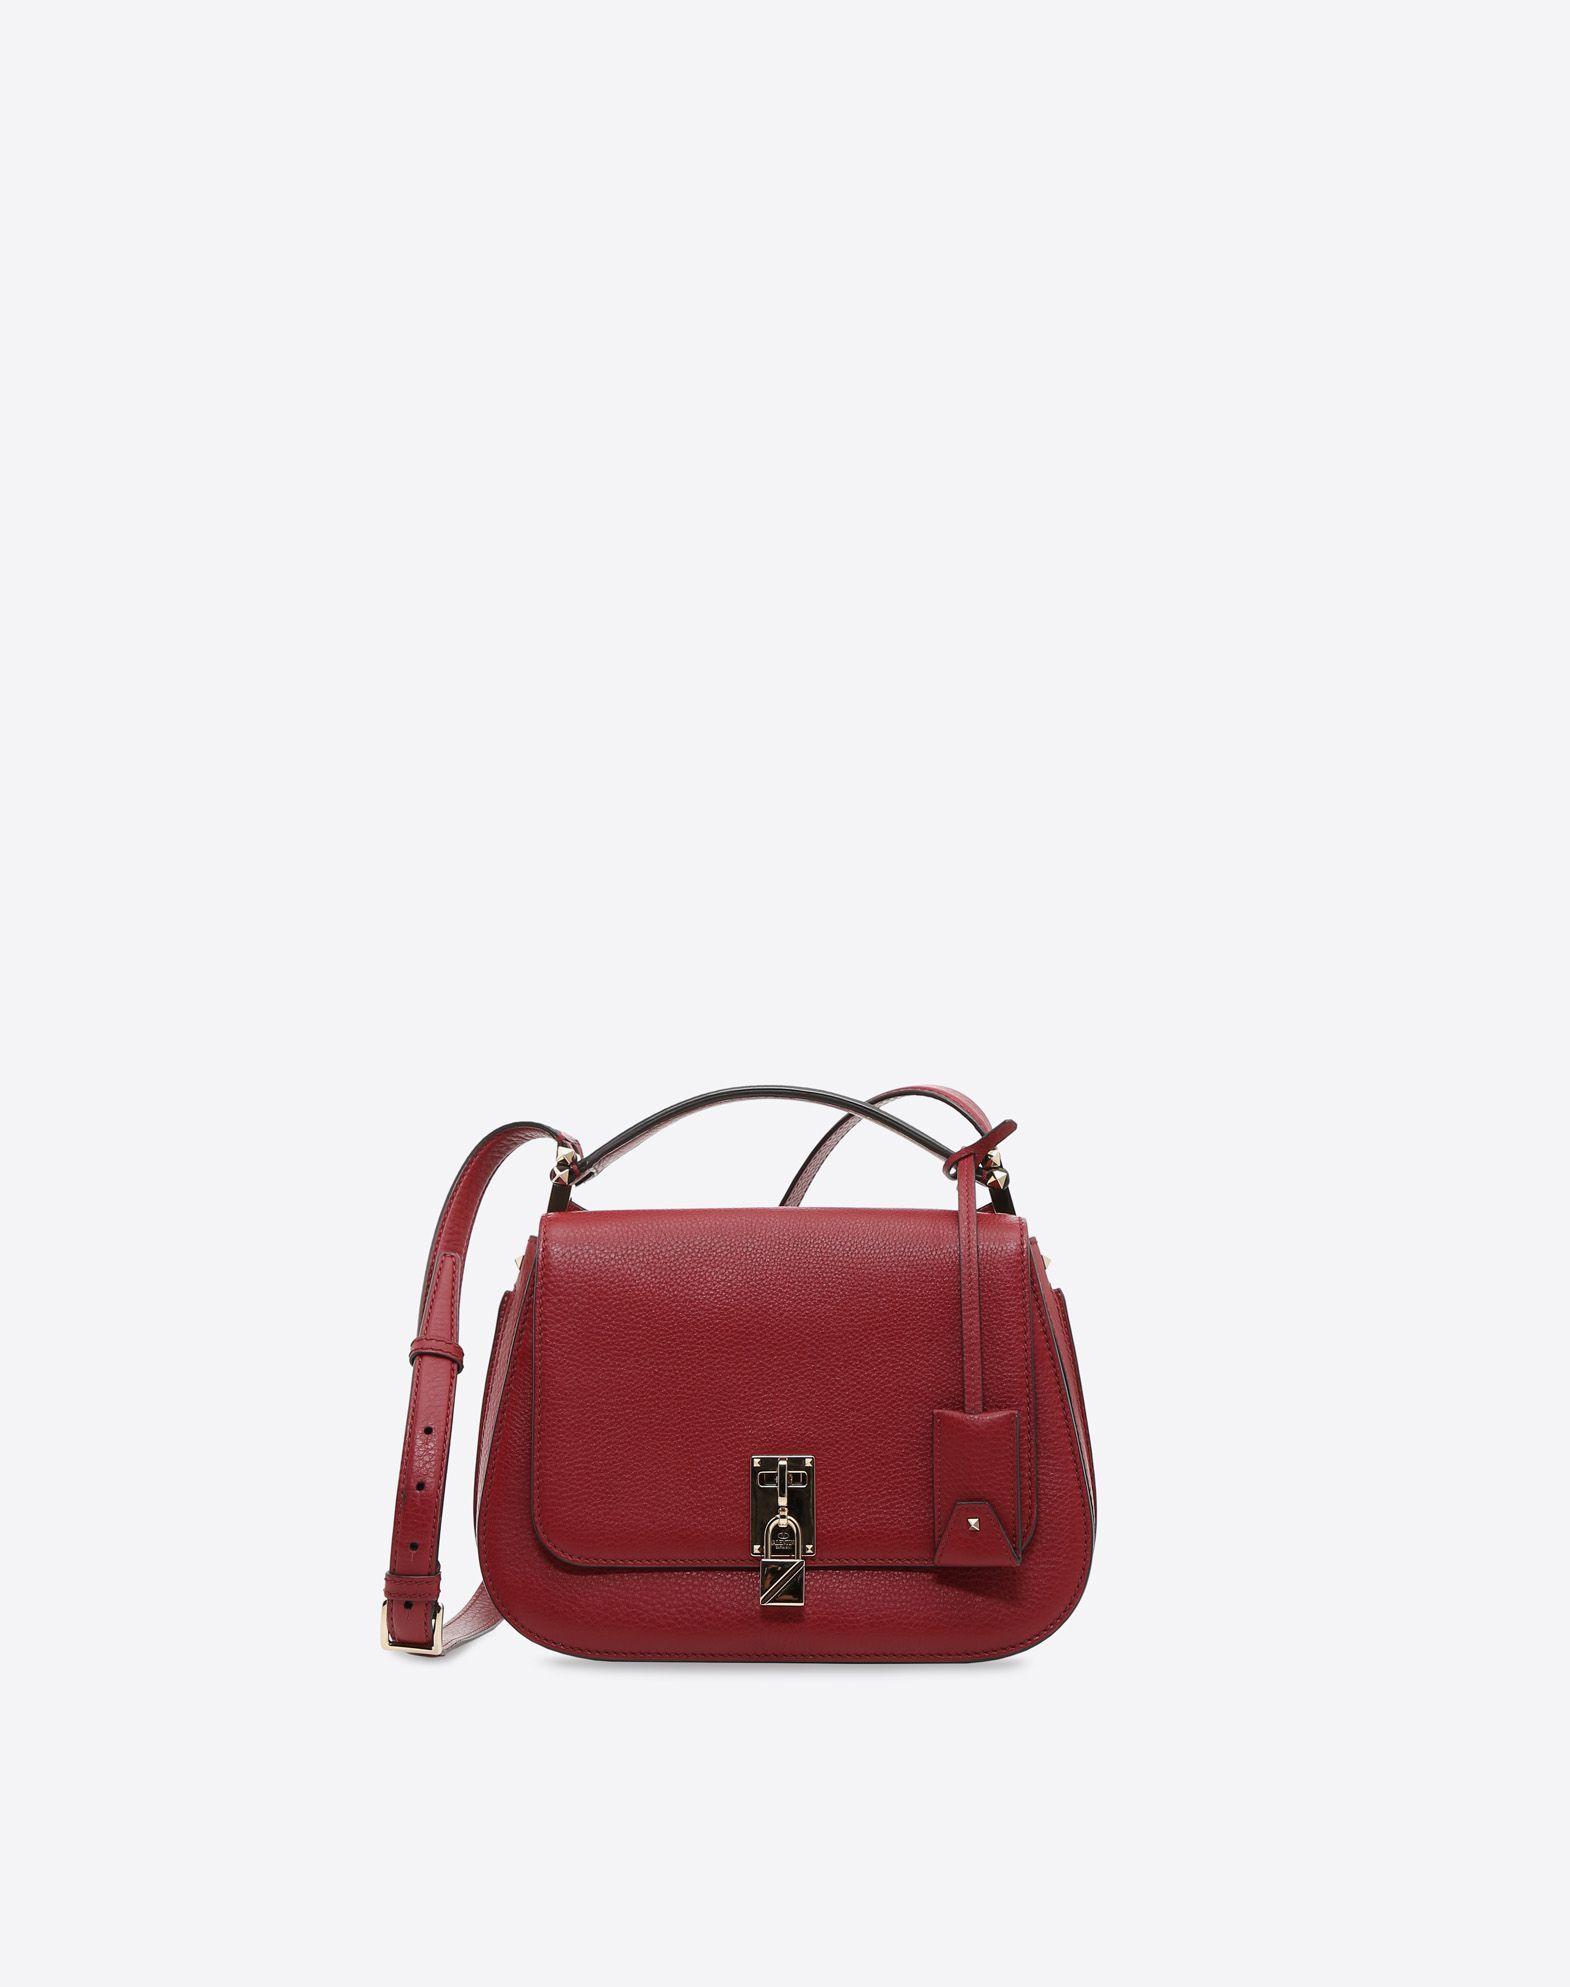 VALENTINO 编织皮 附品牌标志 附品牌标志 锁扣固定 外部多口袋 内部多隔层 真皮背带  13080488vp